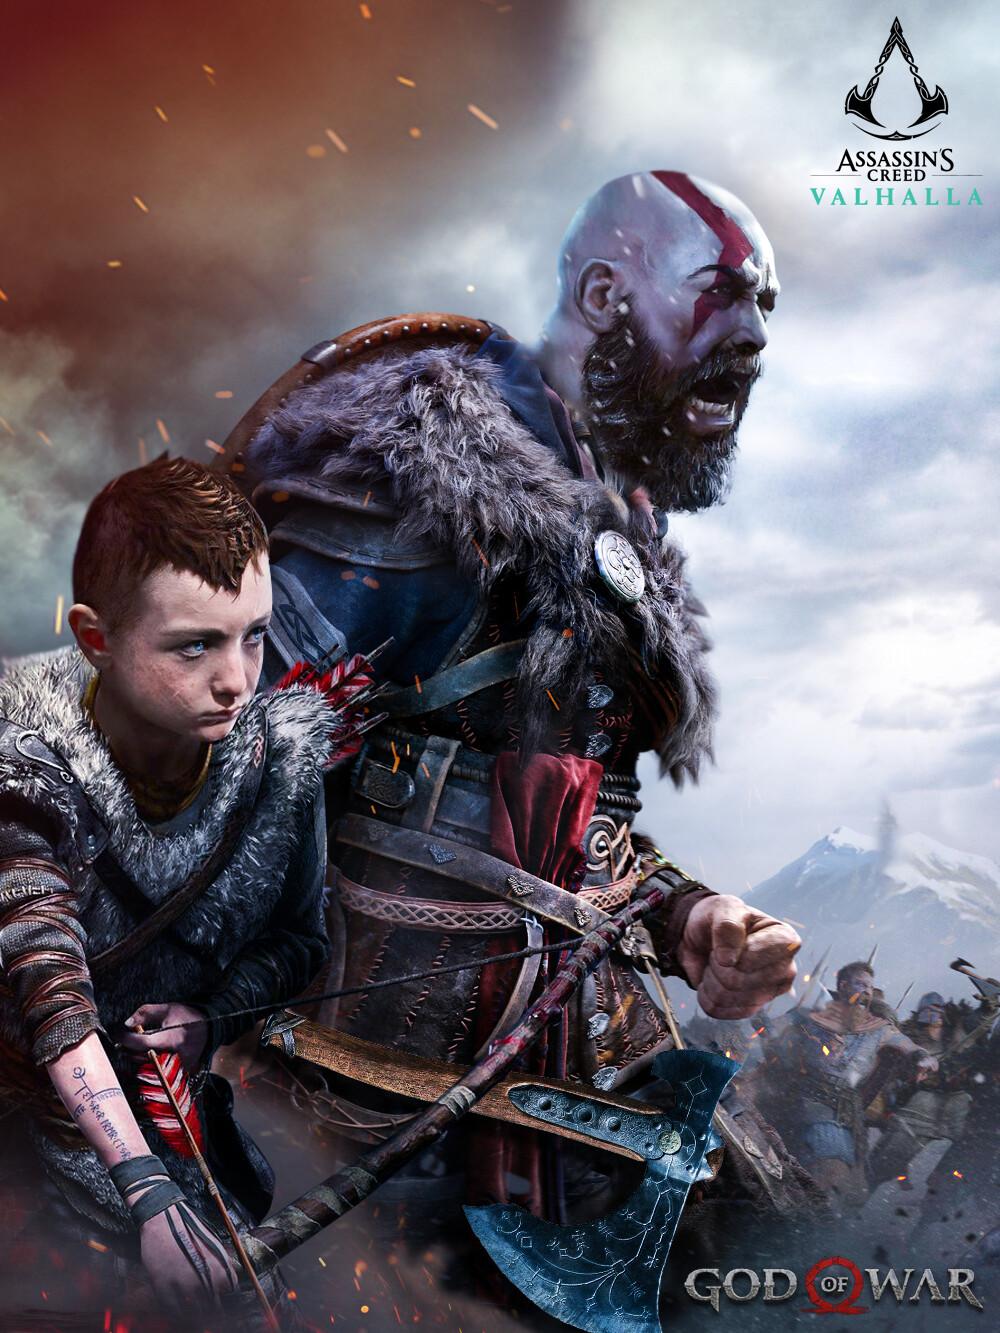 Artstation Assassin S Creed Valhalla God Of War Kris Ugoh